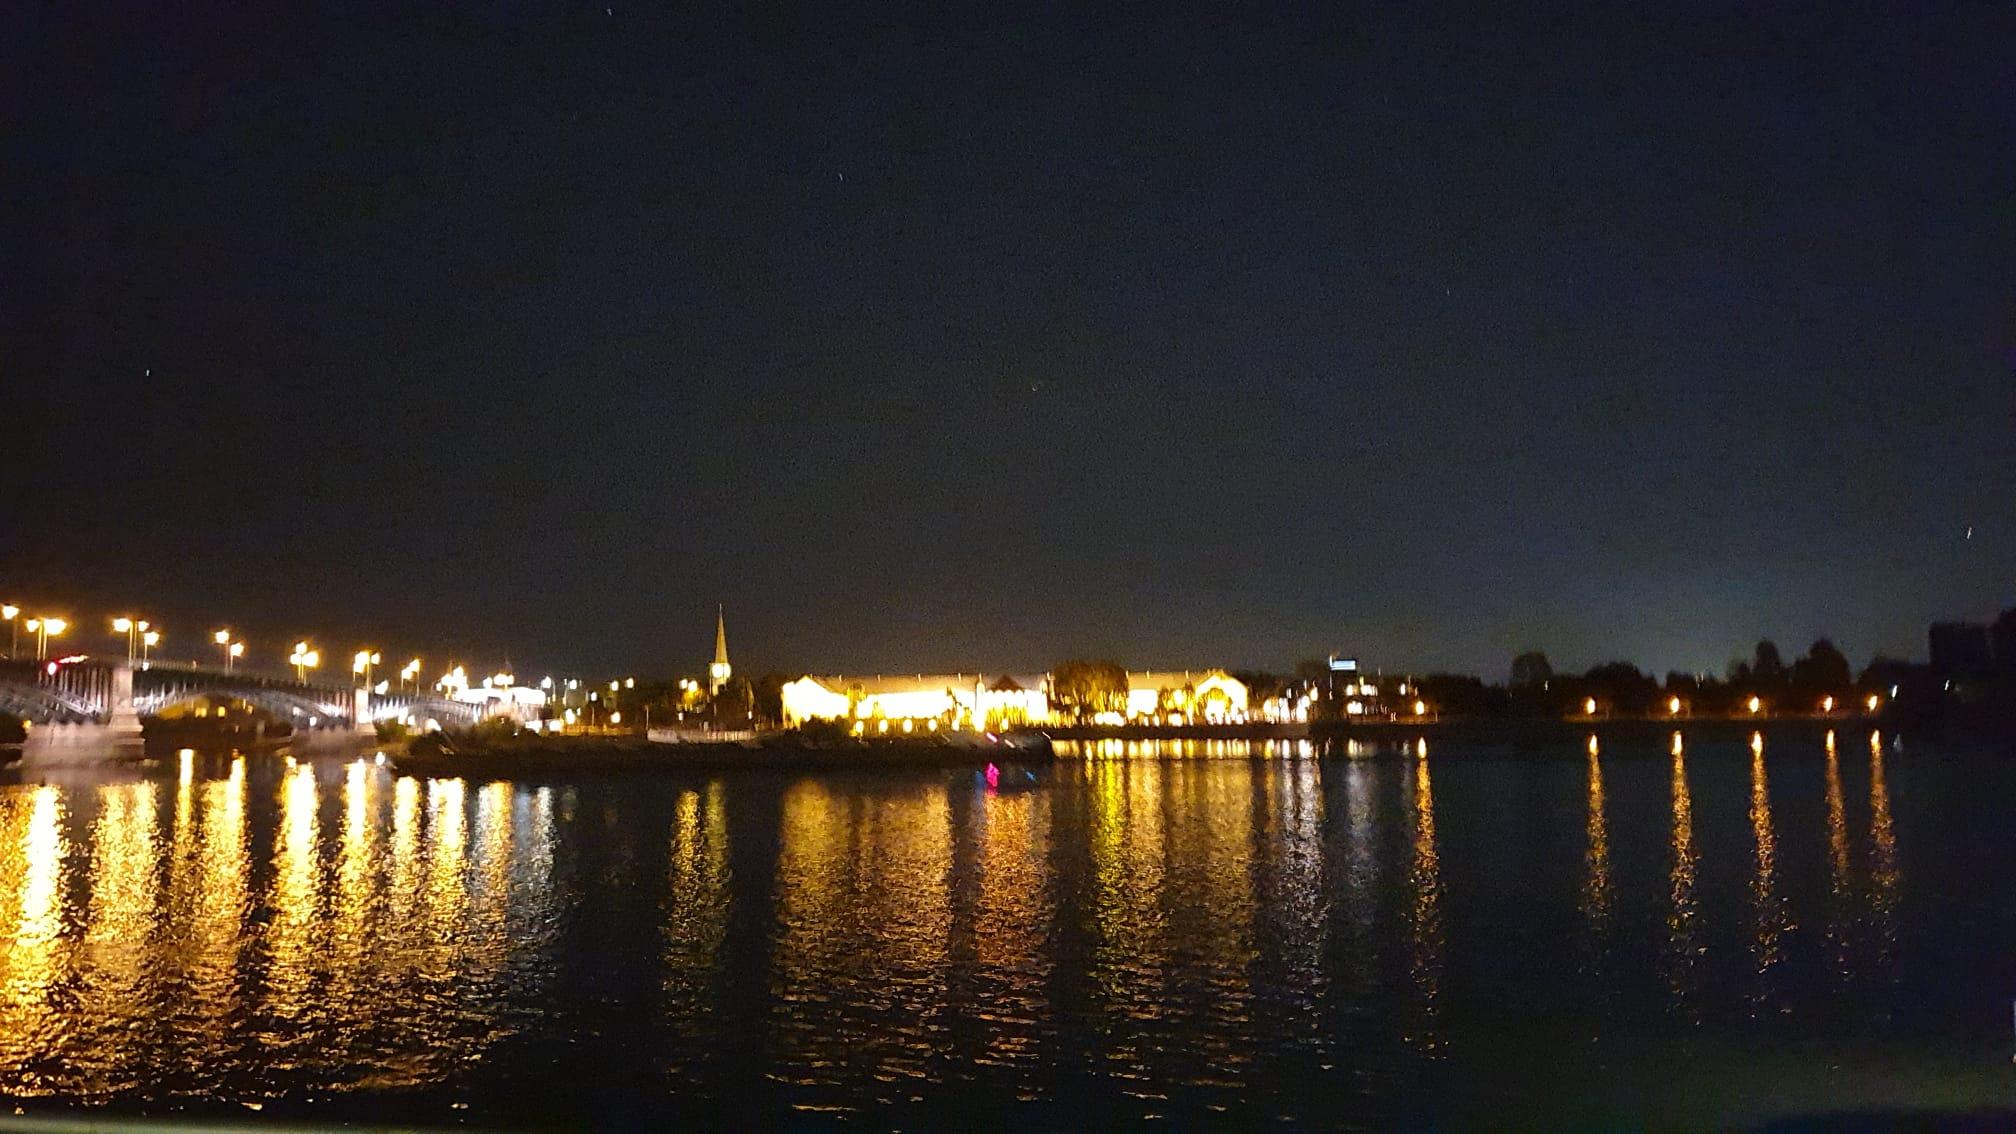 La mia avventura a Mainz, Erika